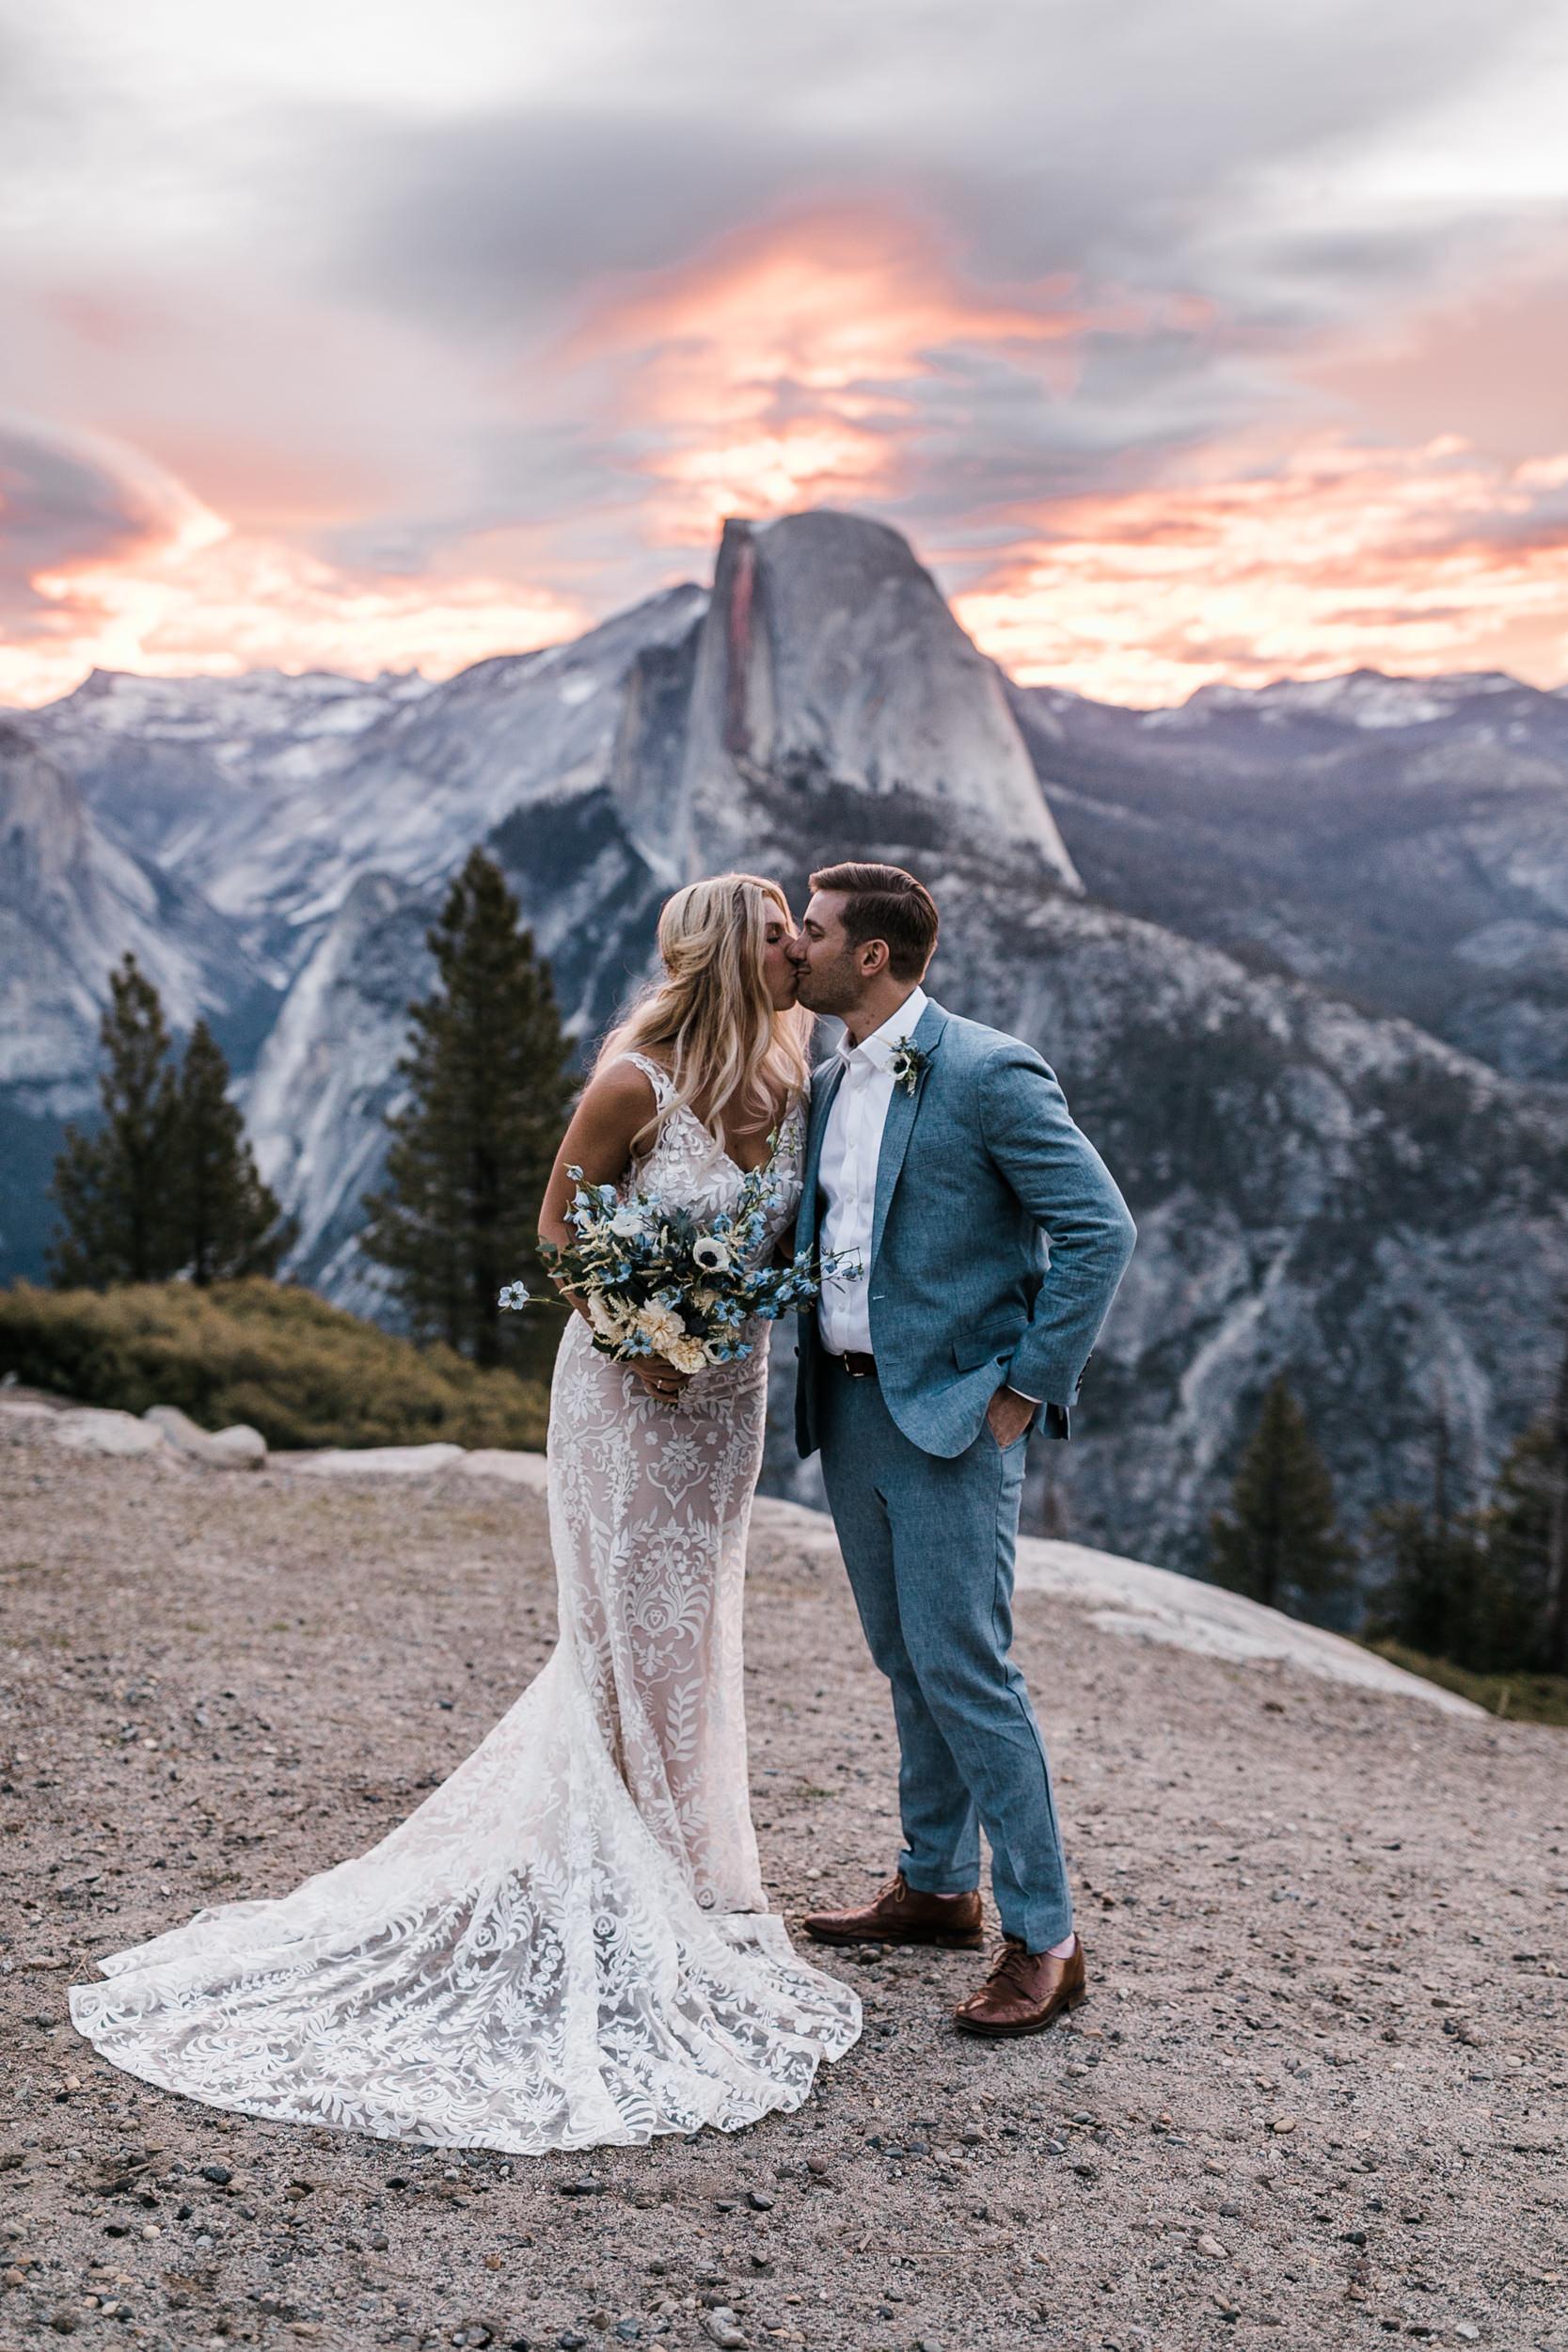 Erika + Grant's intimate Yosemite National Park destination wedding + romantic backyard reception under twinkle lights | glacier point sunrise first look | the hearnes adventure photography